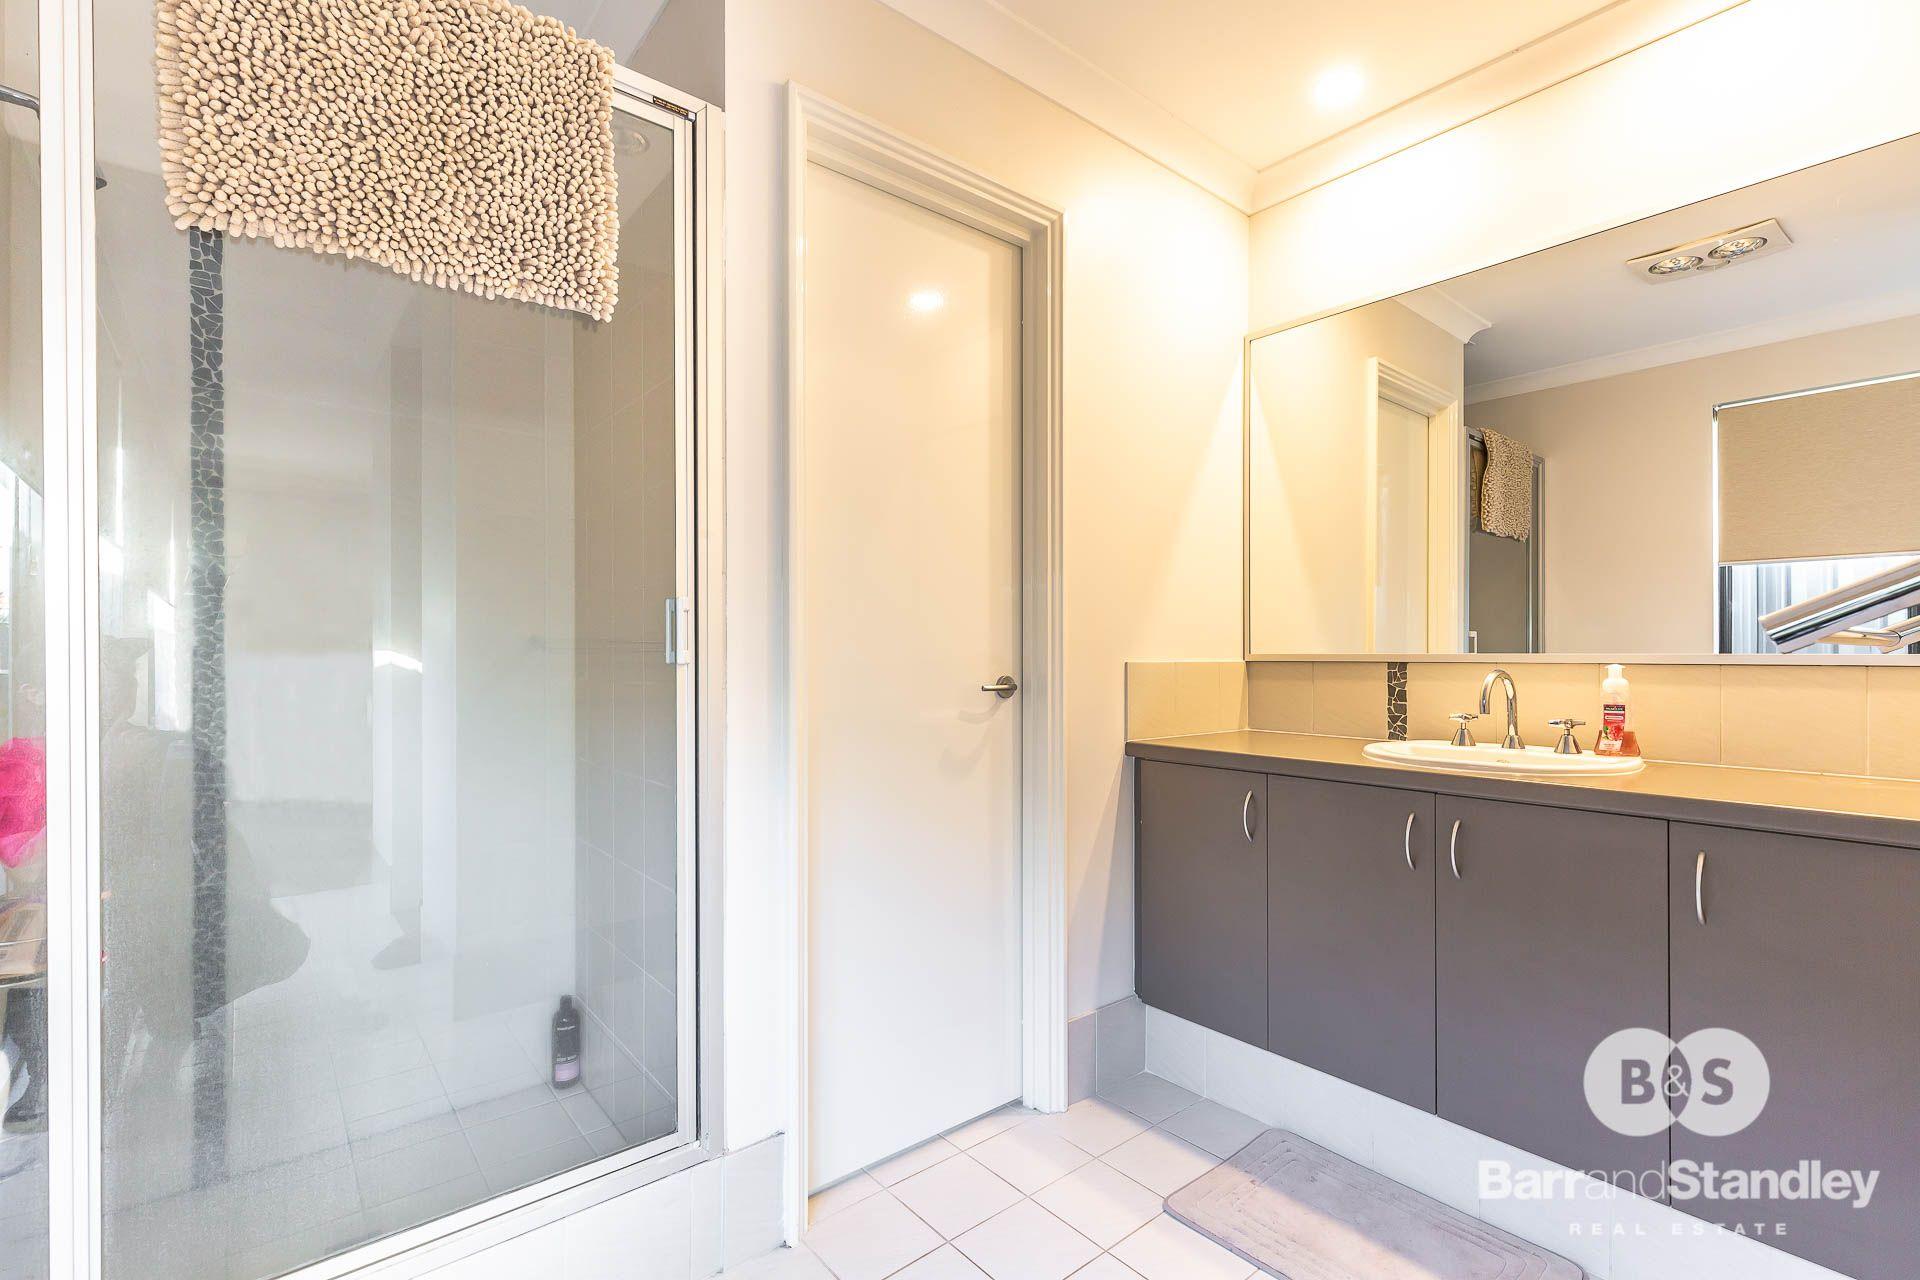 72 Barnes Avenue, Australind